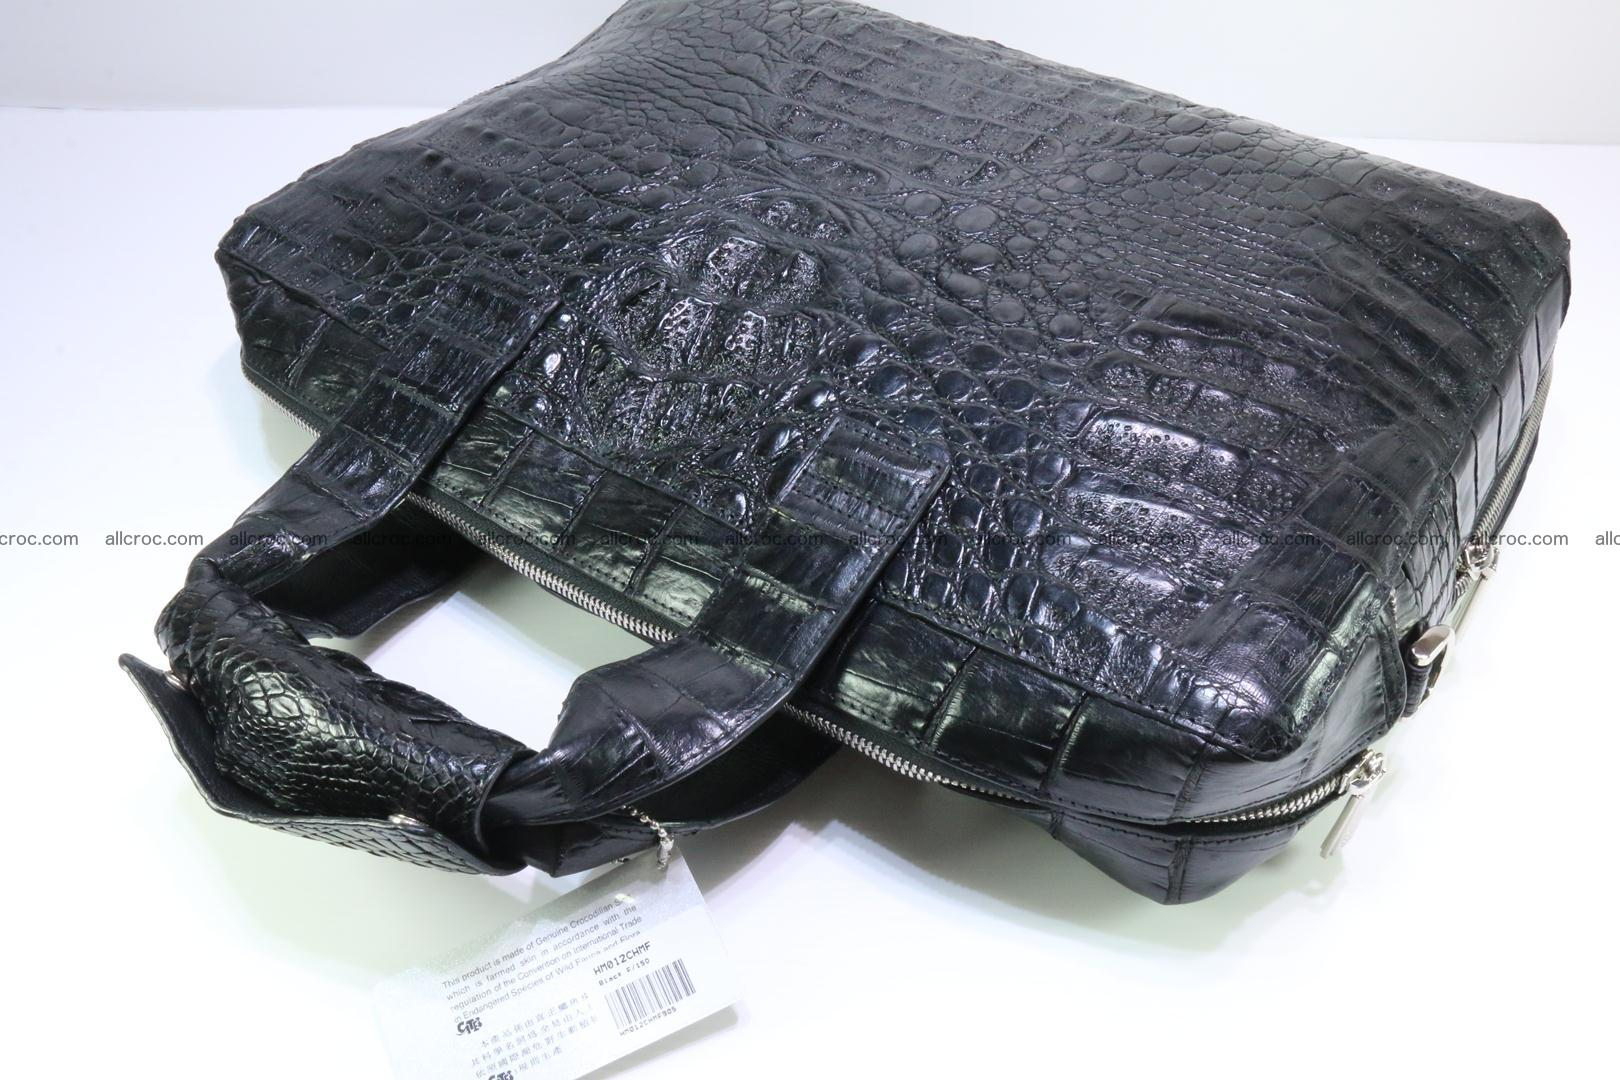 Crocodile skin handbag 127 Foto 7